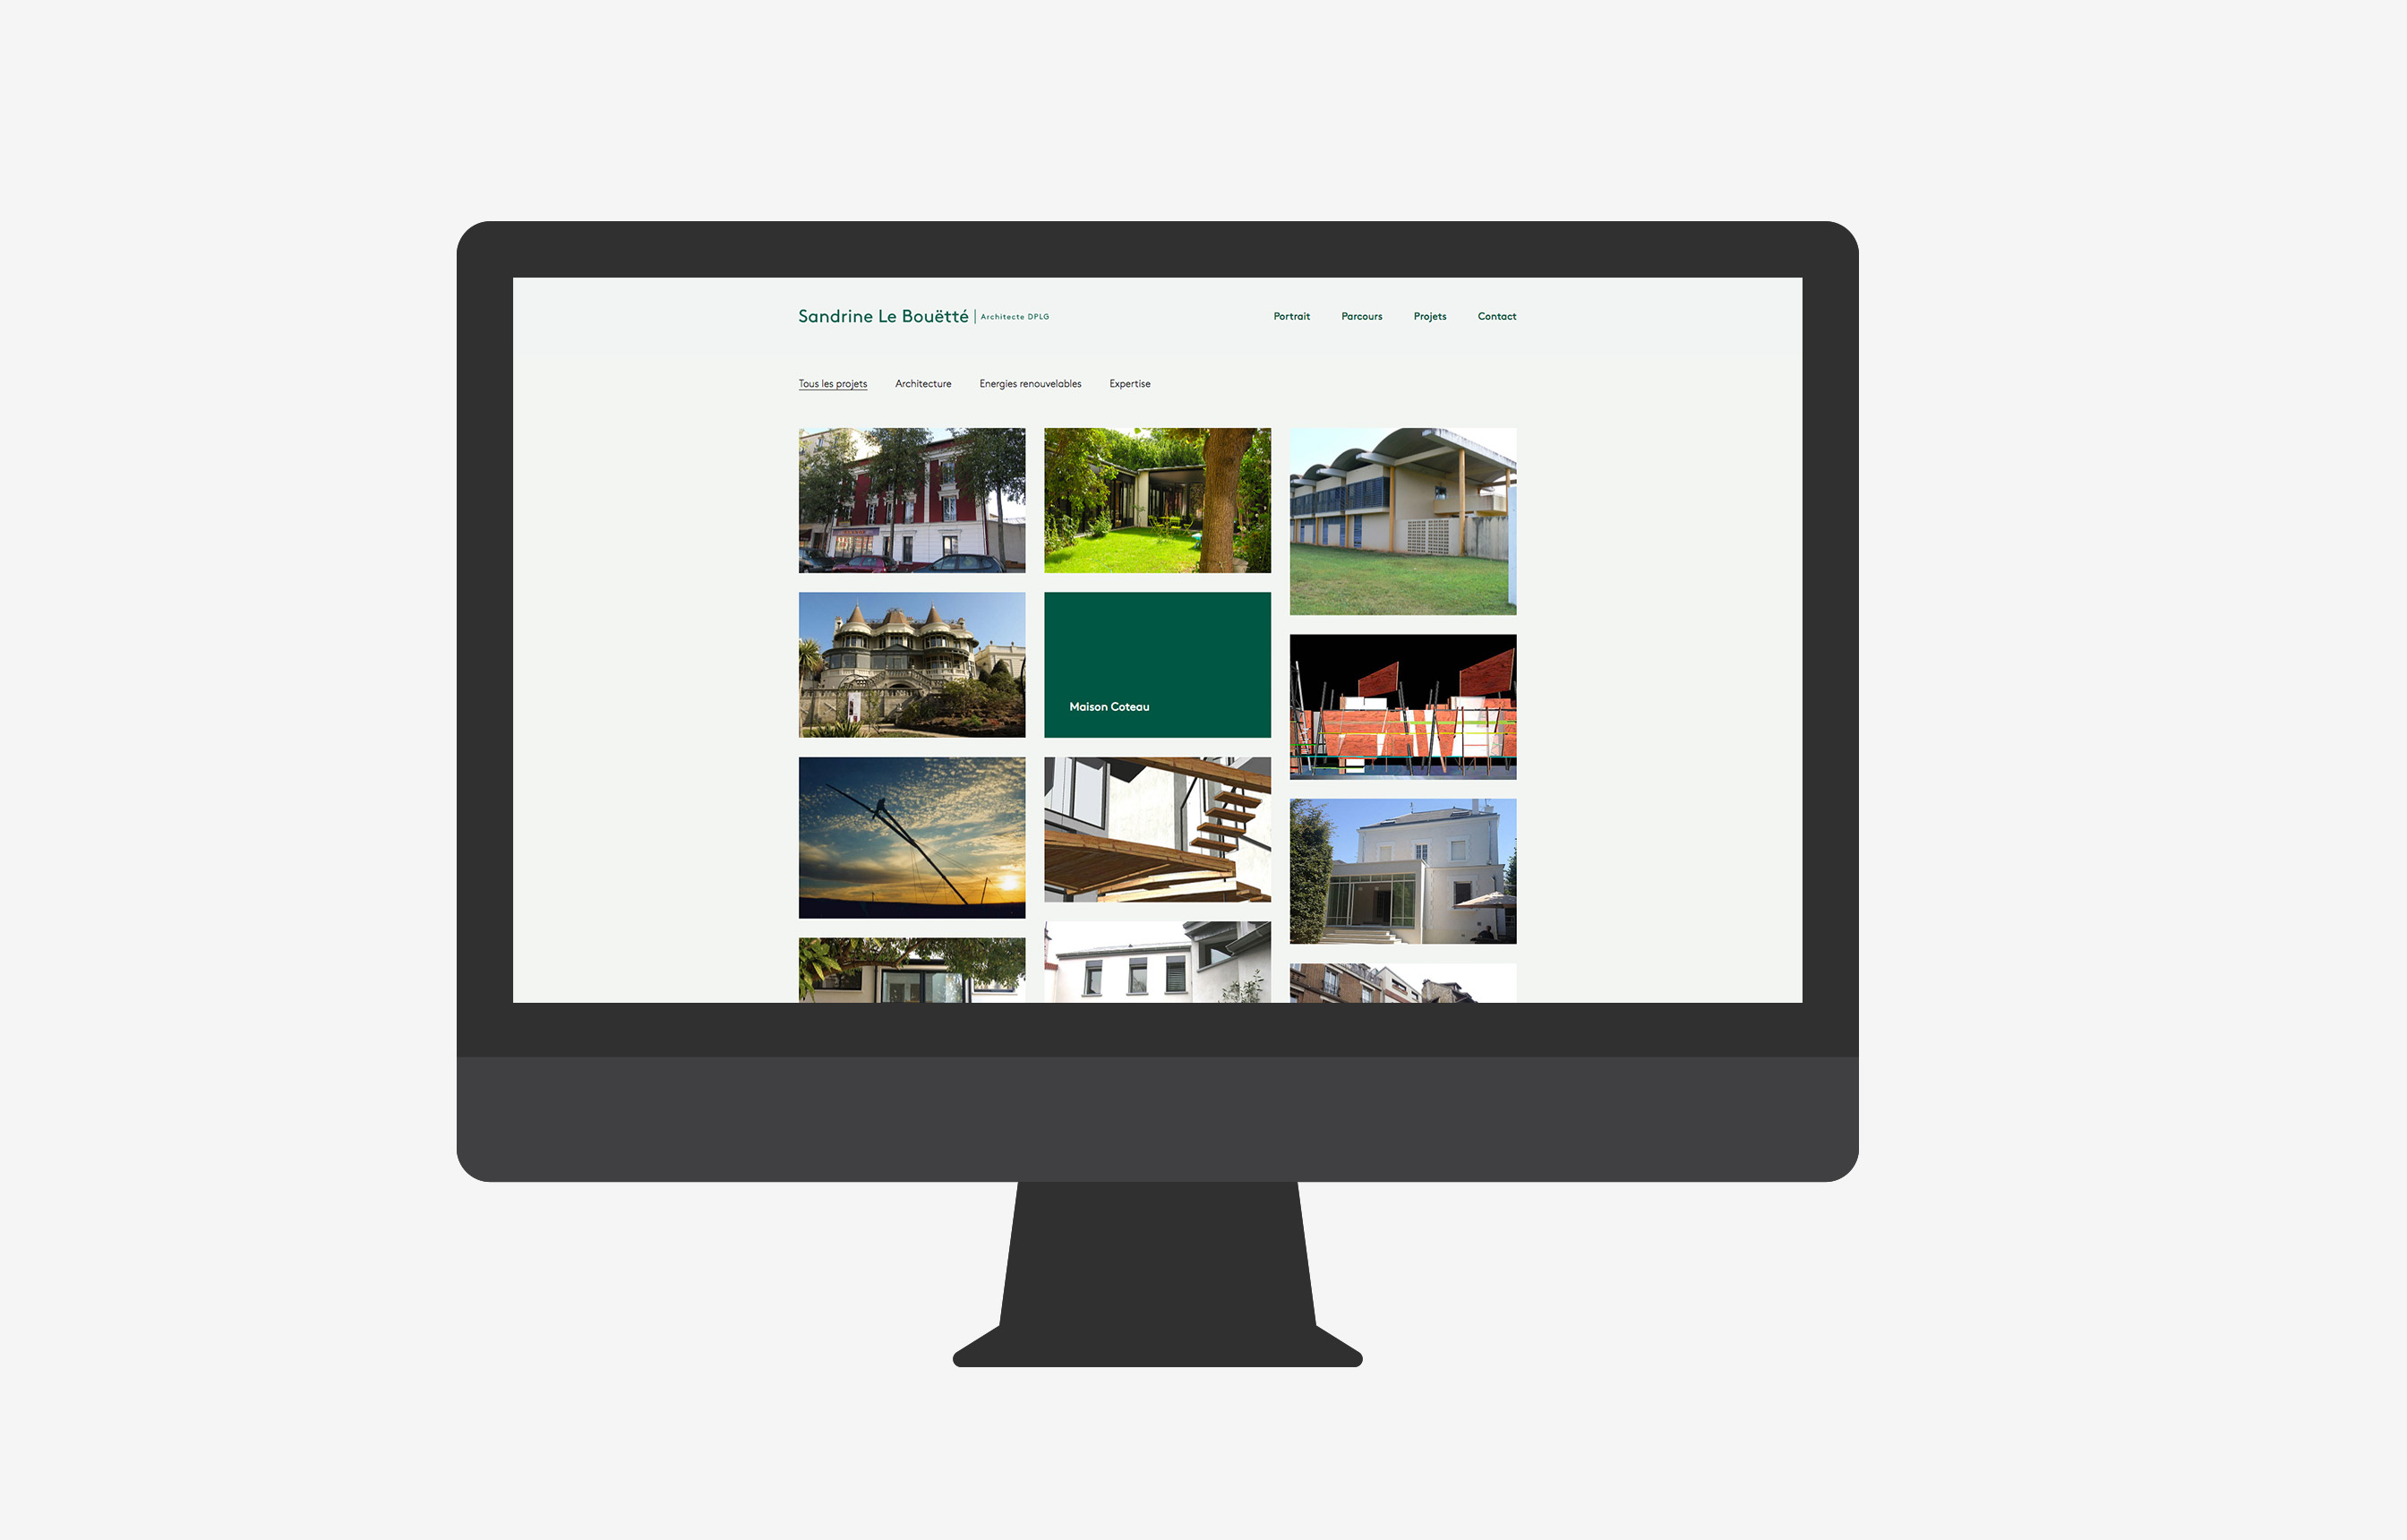 01-slb-architecte-pikteo-webdesign-graphic-design-freelance-paris-bruxelles-londres